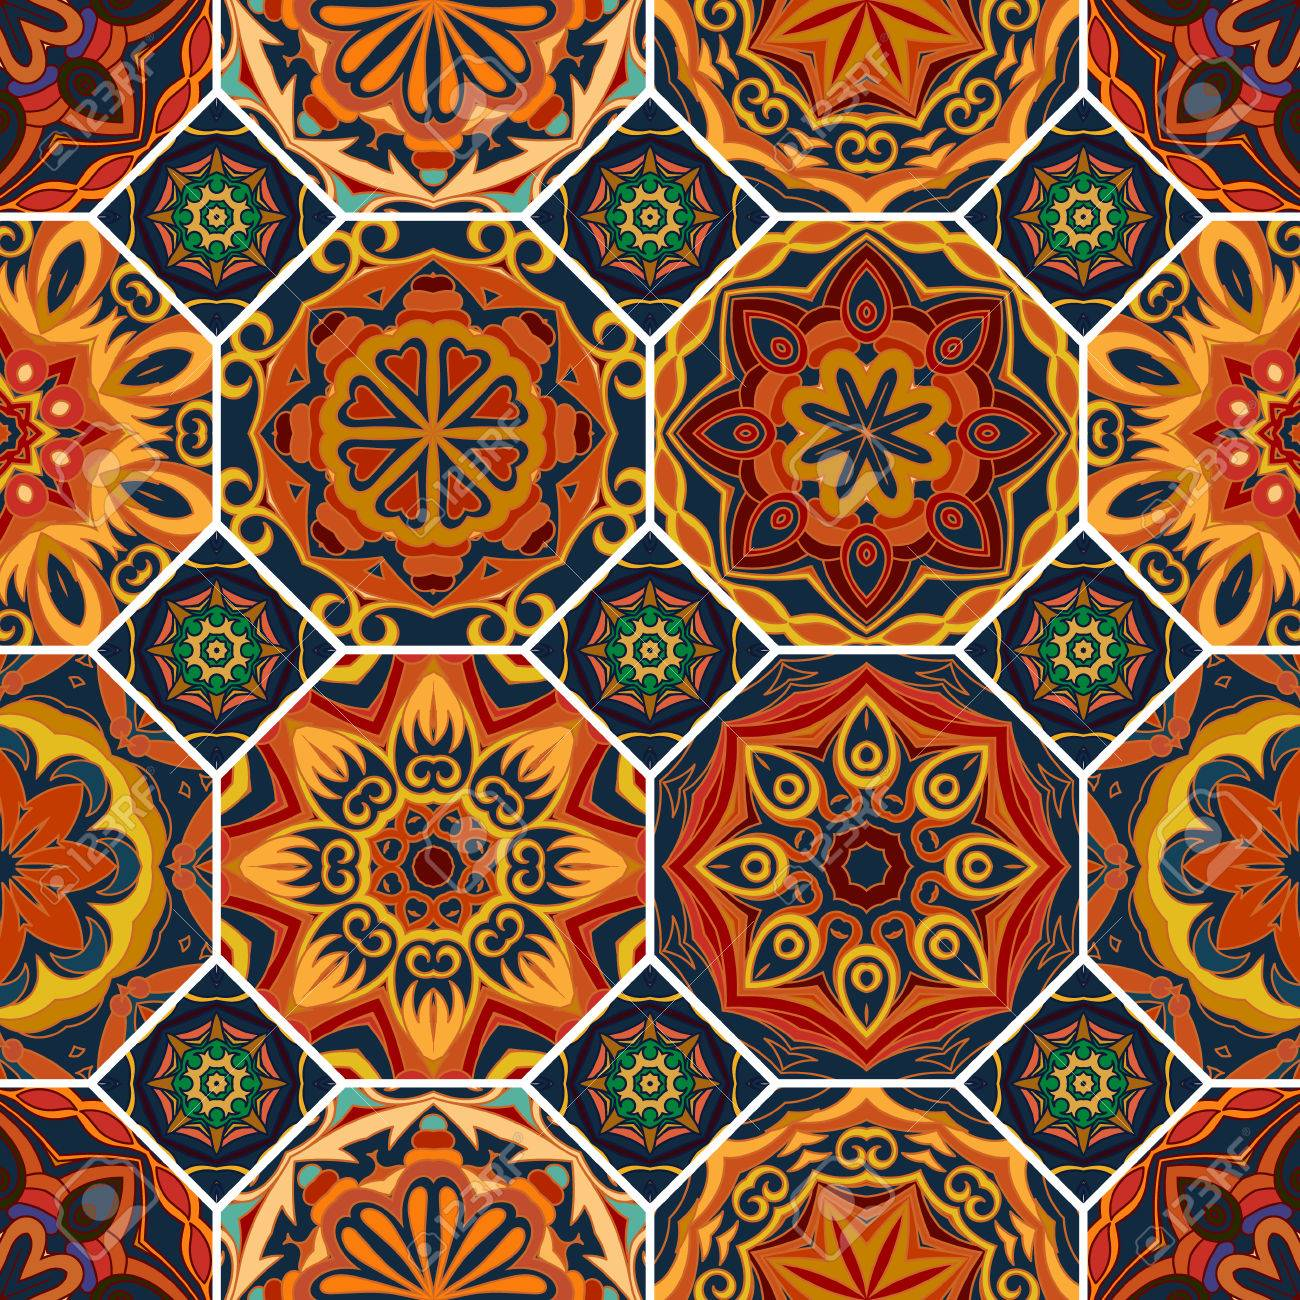 Gorgeous Floral Tile Design Moroccan Or Mediterranean Octagon Tiles Tribal Ornaments For Wallpaper